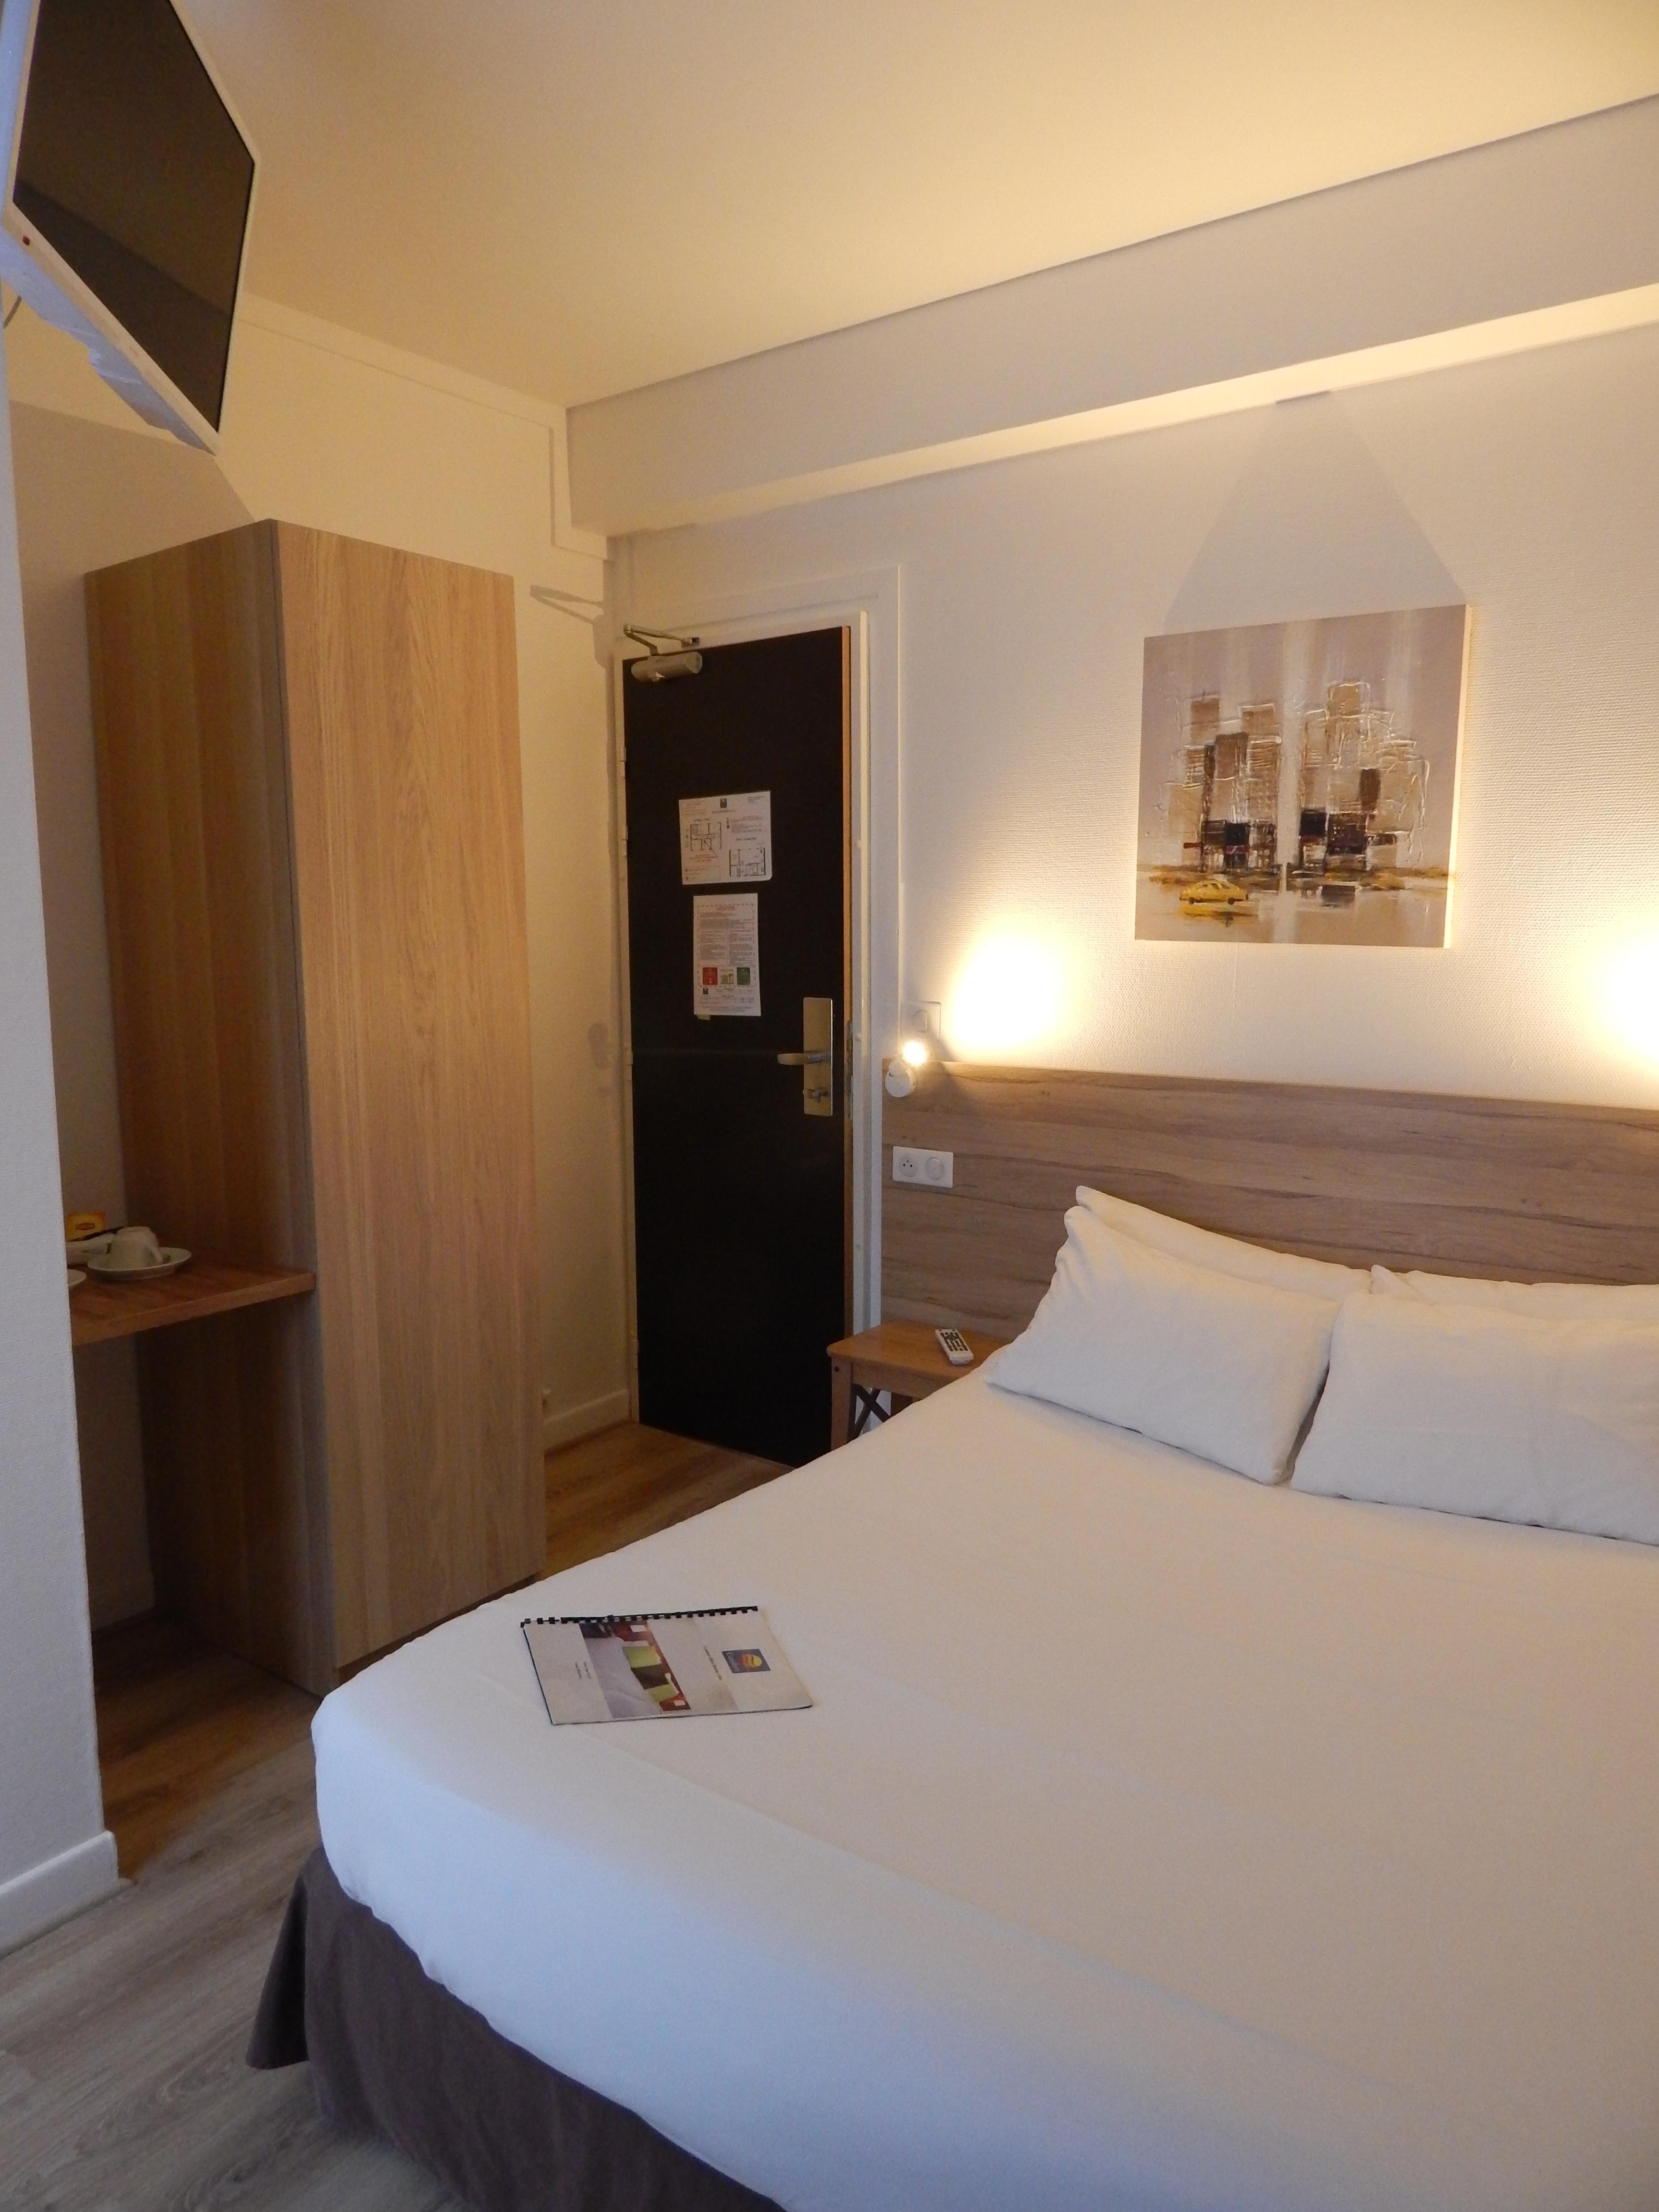 Comfort Hotel Rouen Alba 2 étoiles au coeur de Rouen